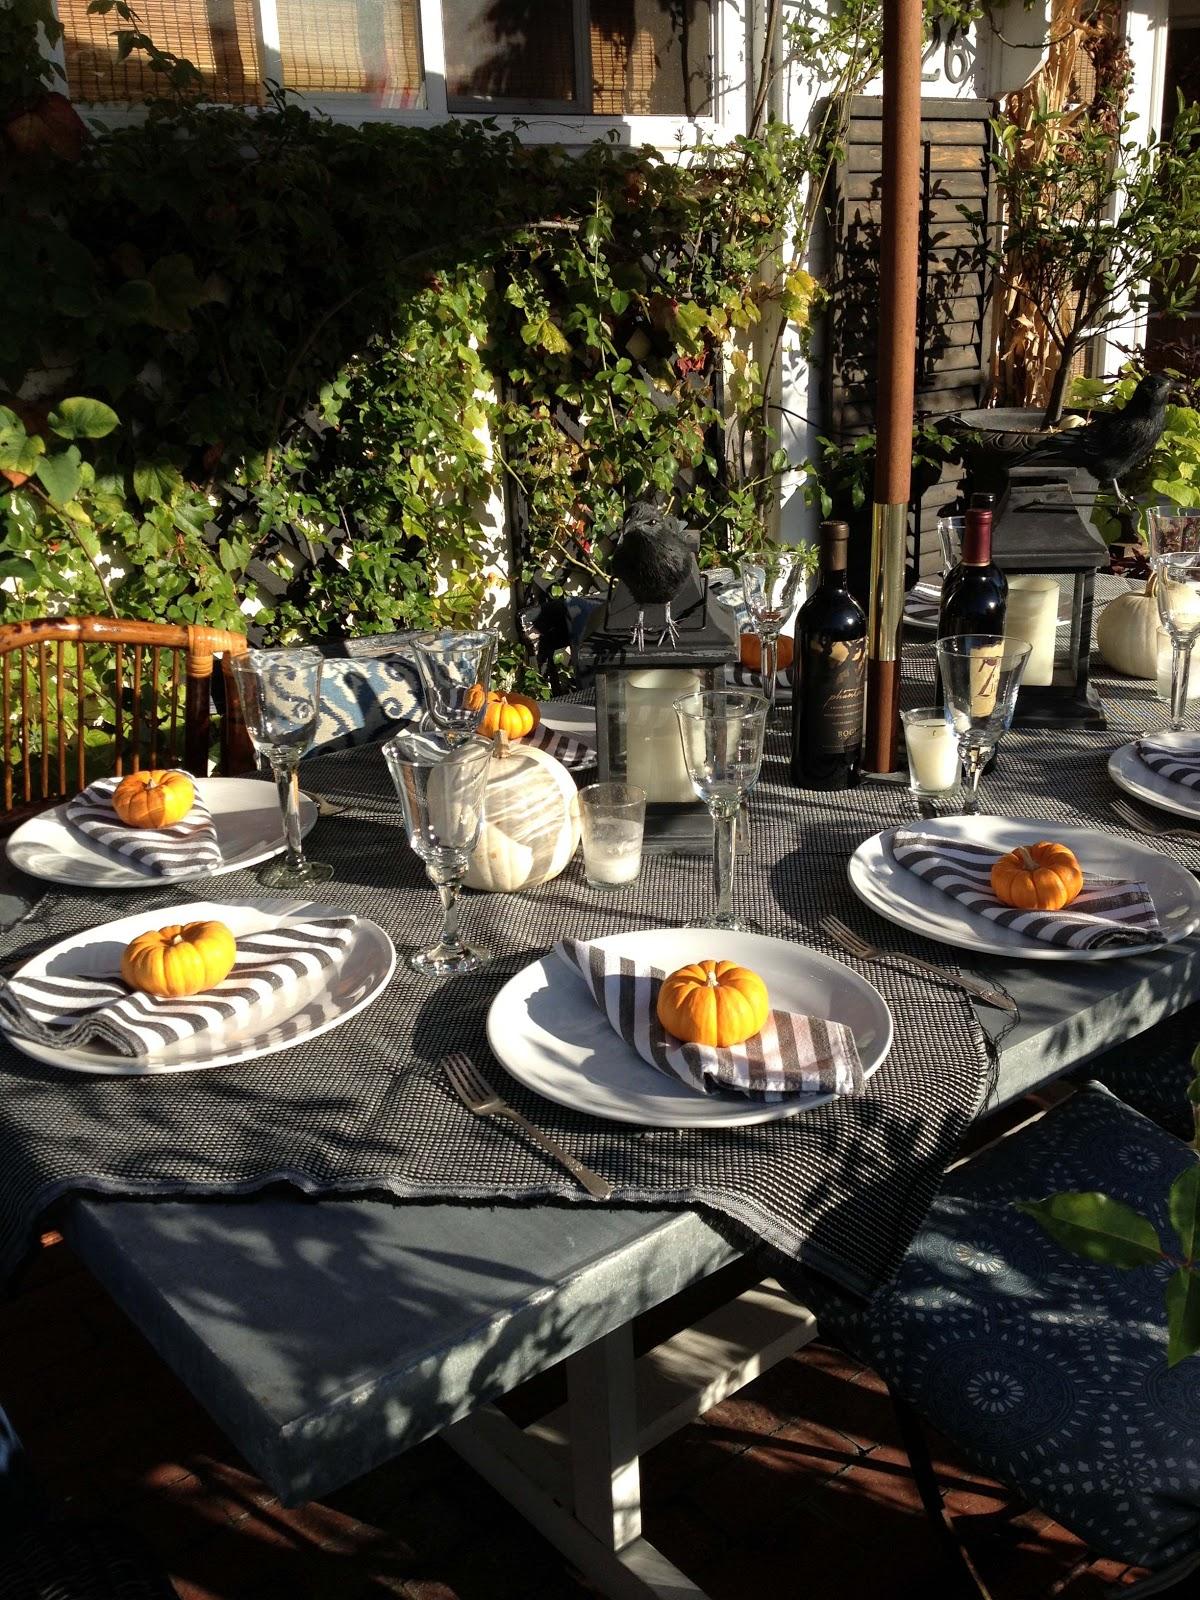 The Willows Home Garden Halloween Dinner Party